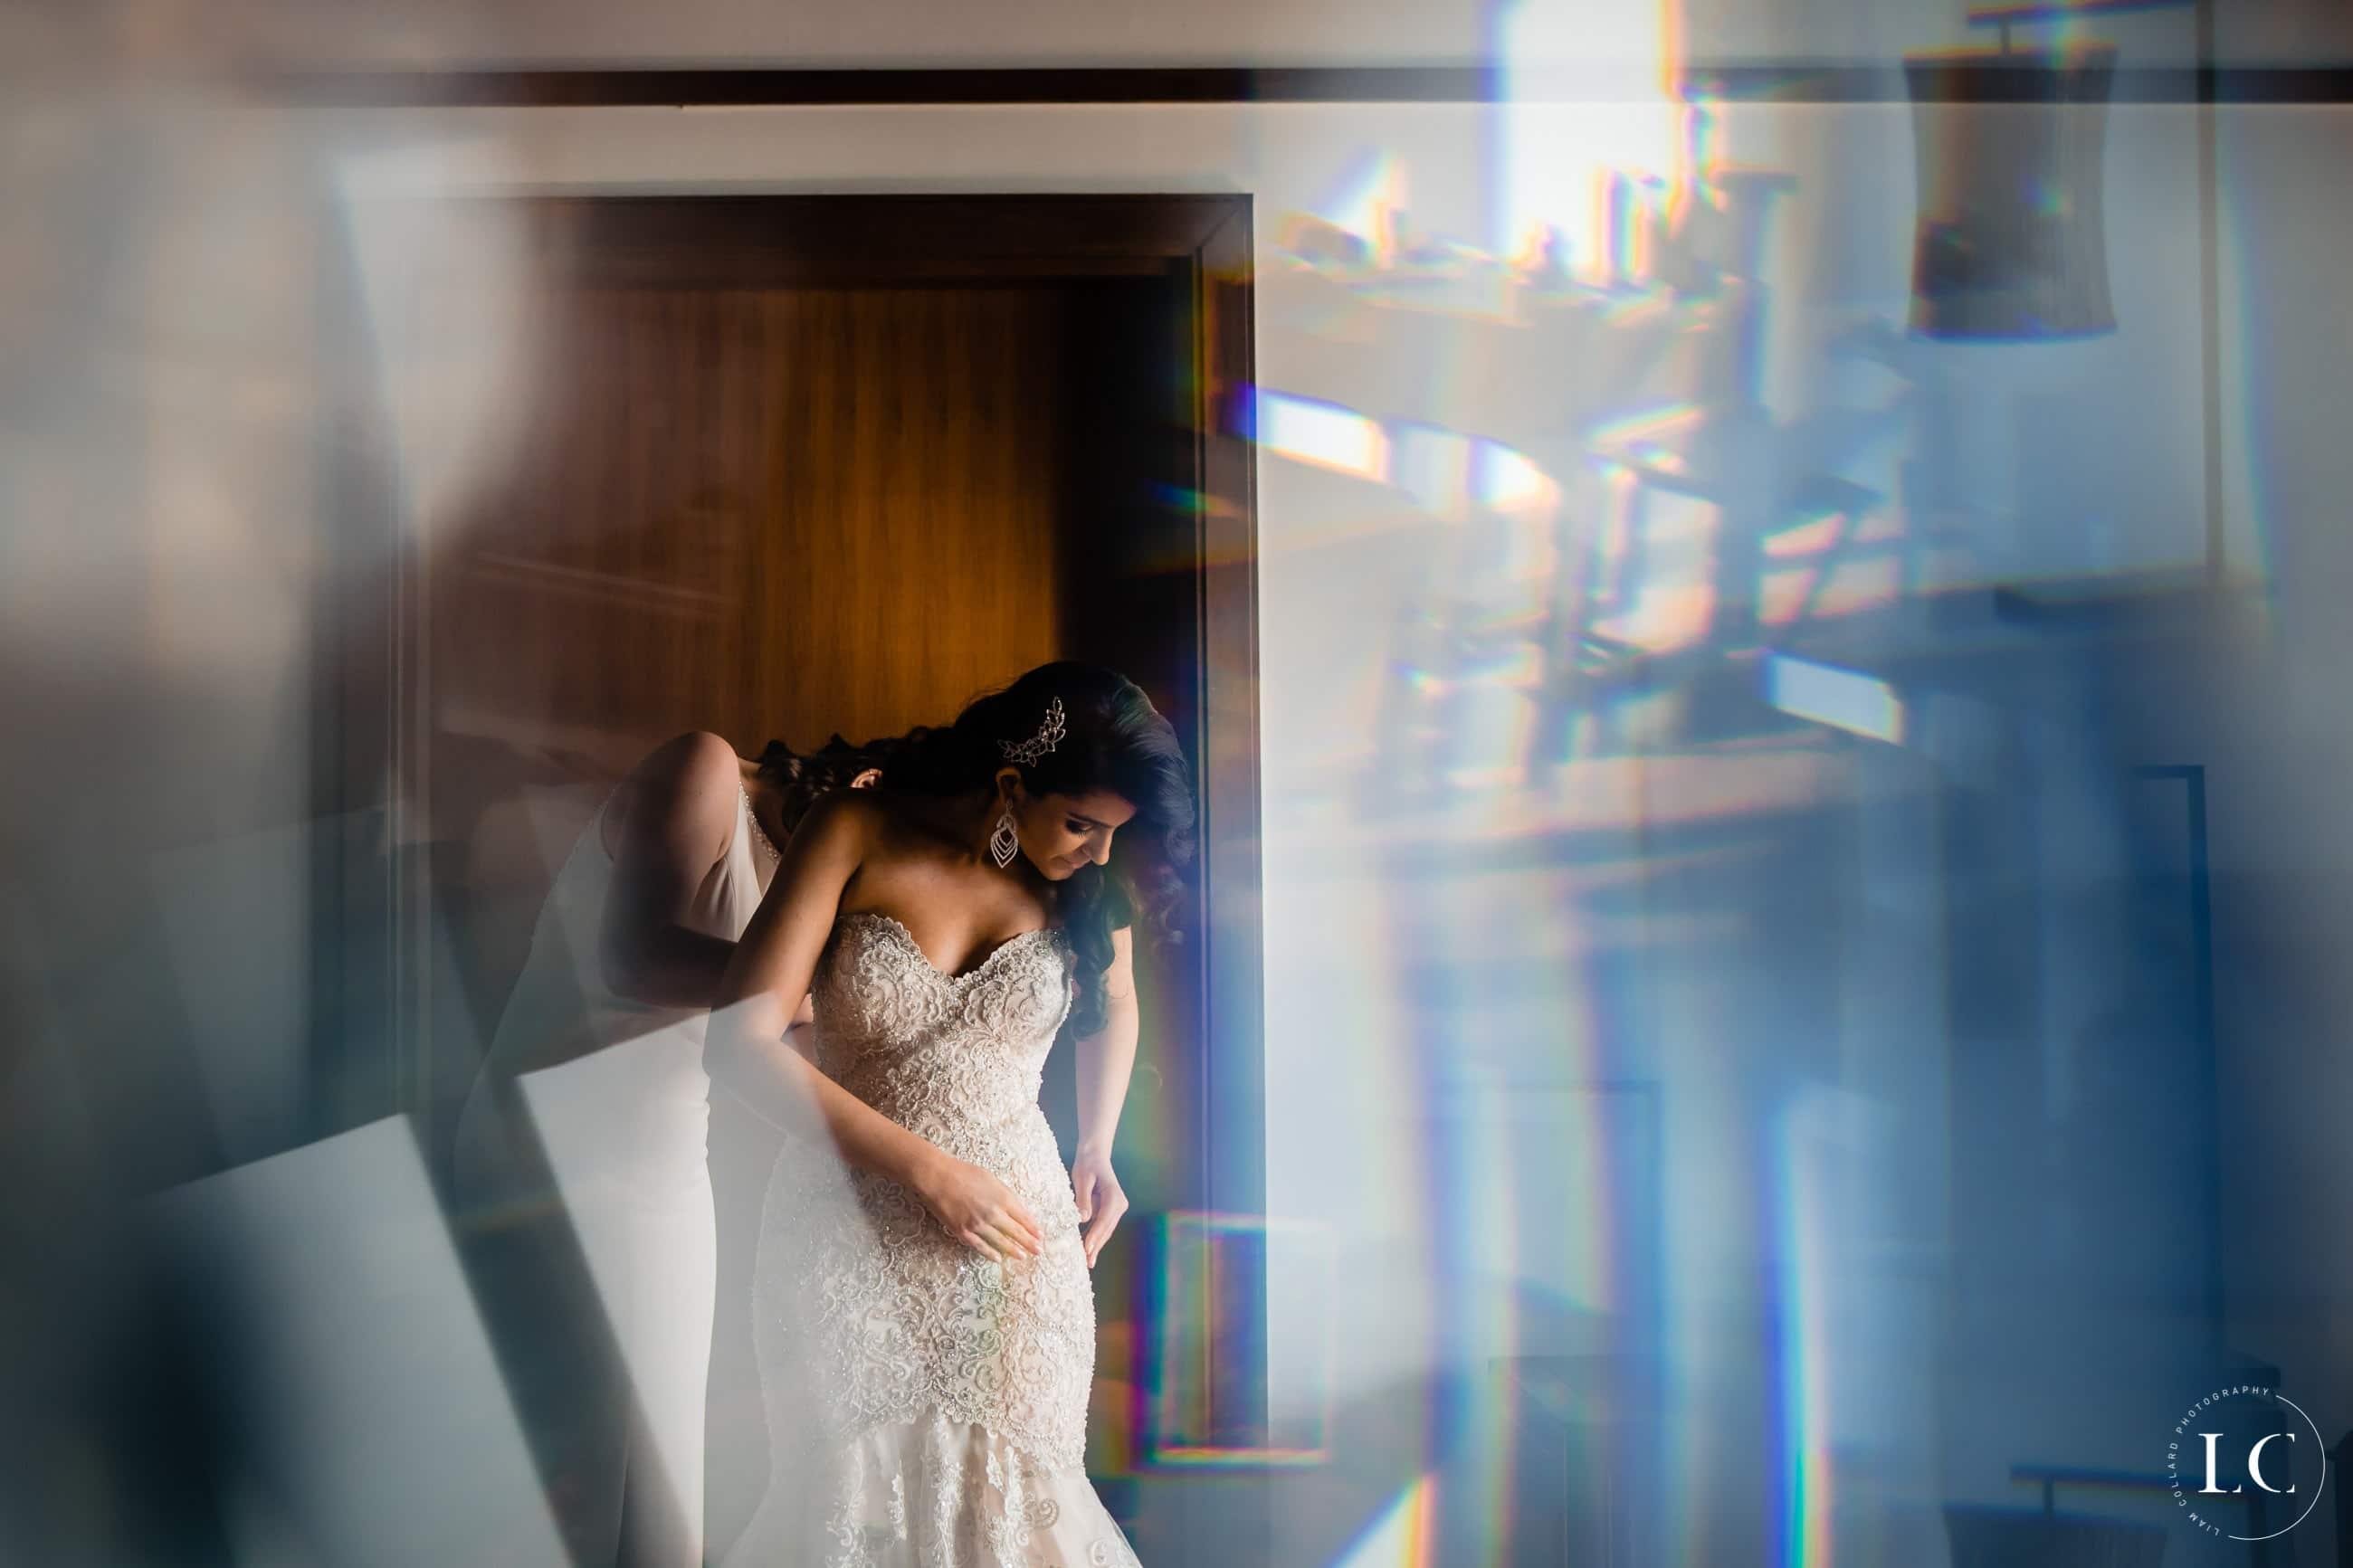 Distorted image of bride fixing her dress